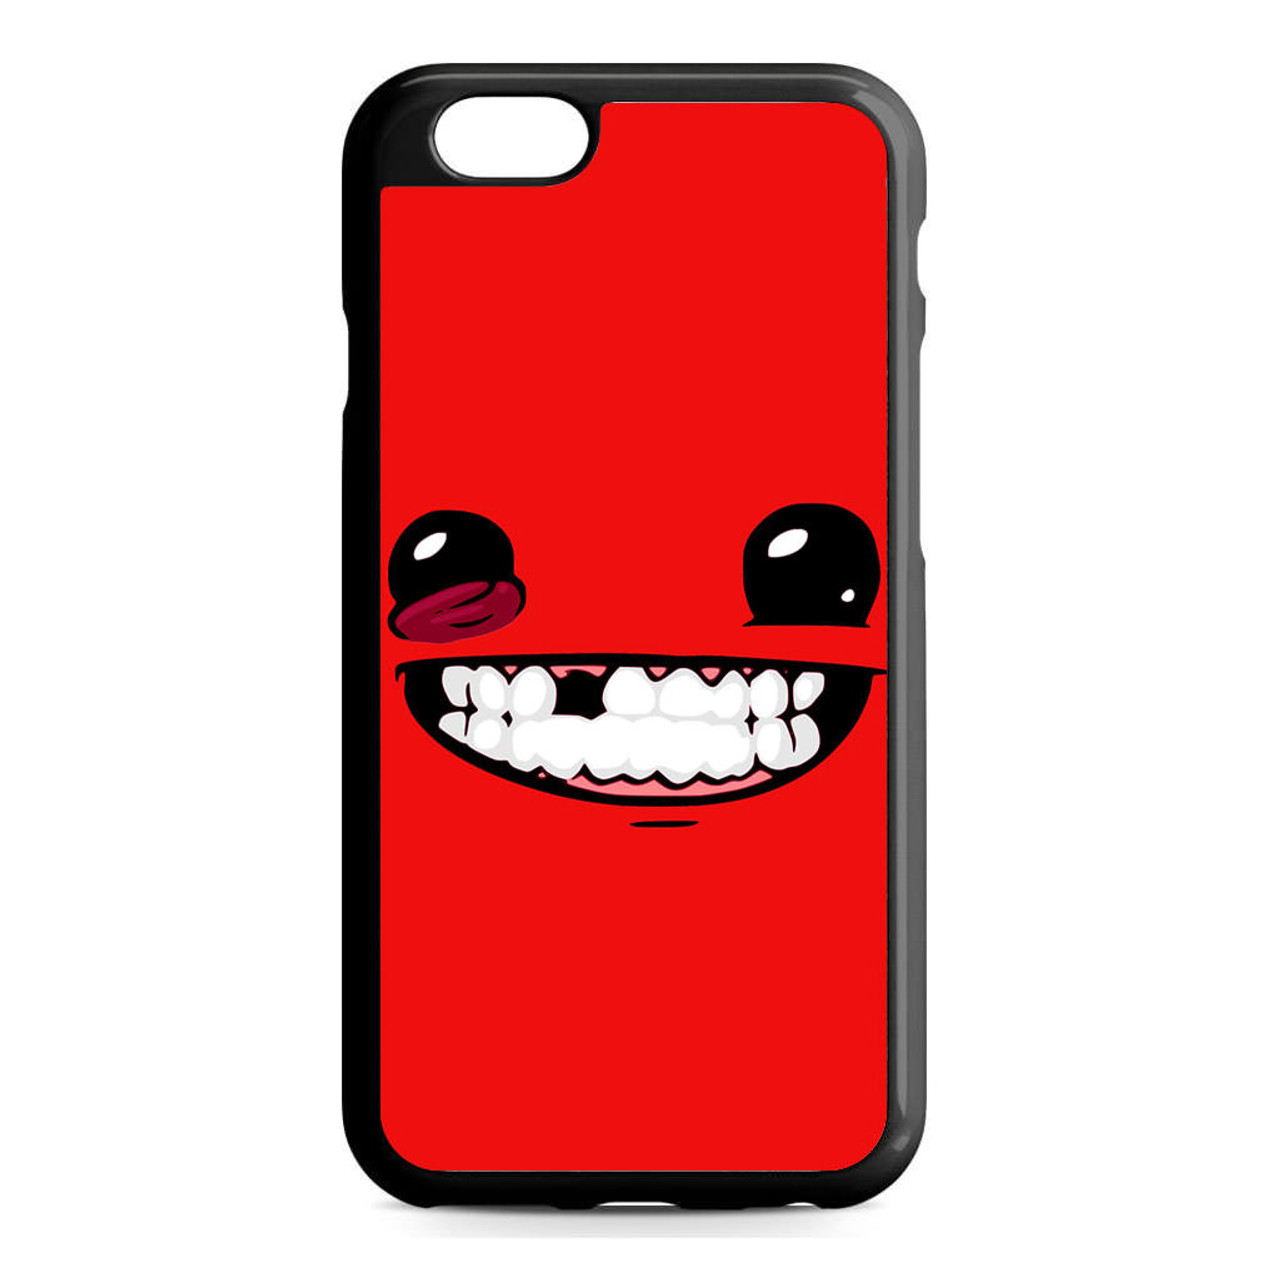 boys iphone 6 case